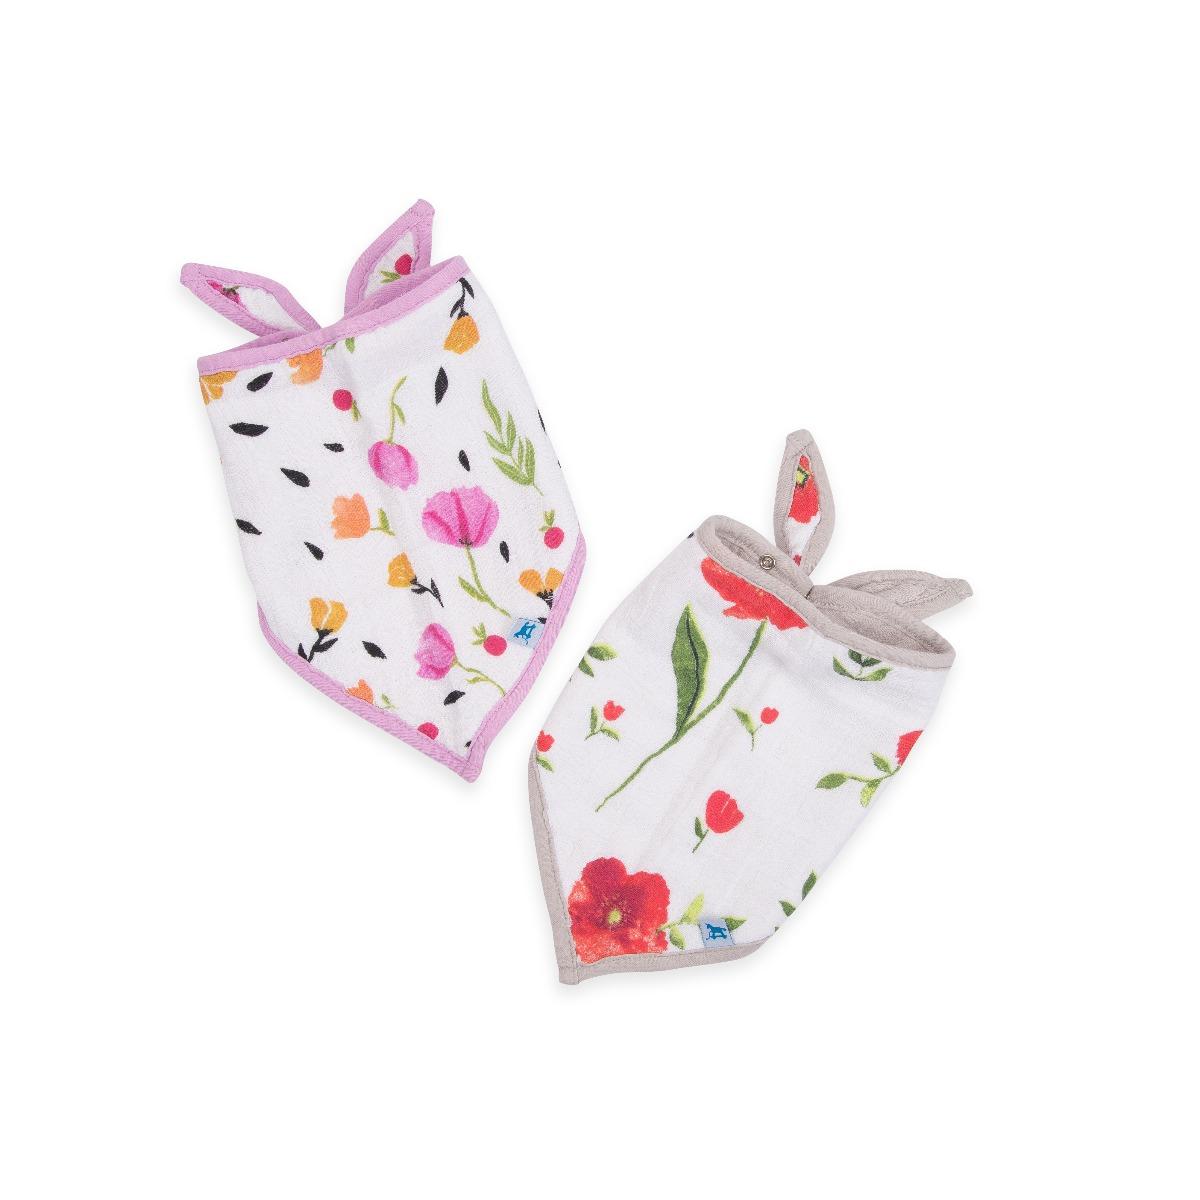 Little Unicorn 2-Pack Cotton Muslin Bandana Bib Set Summer Poppy